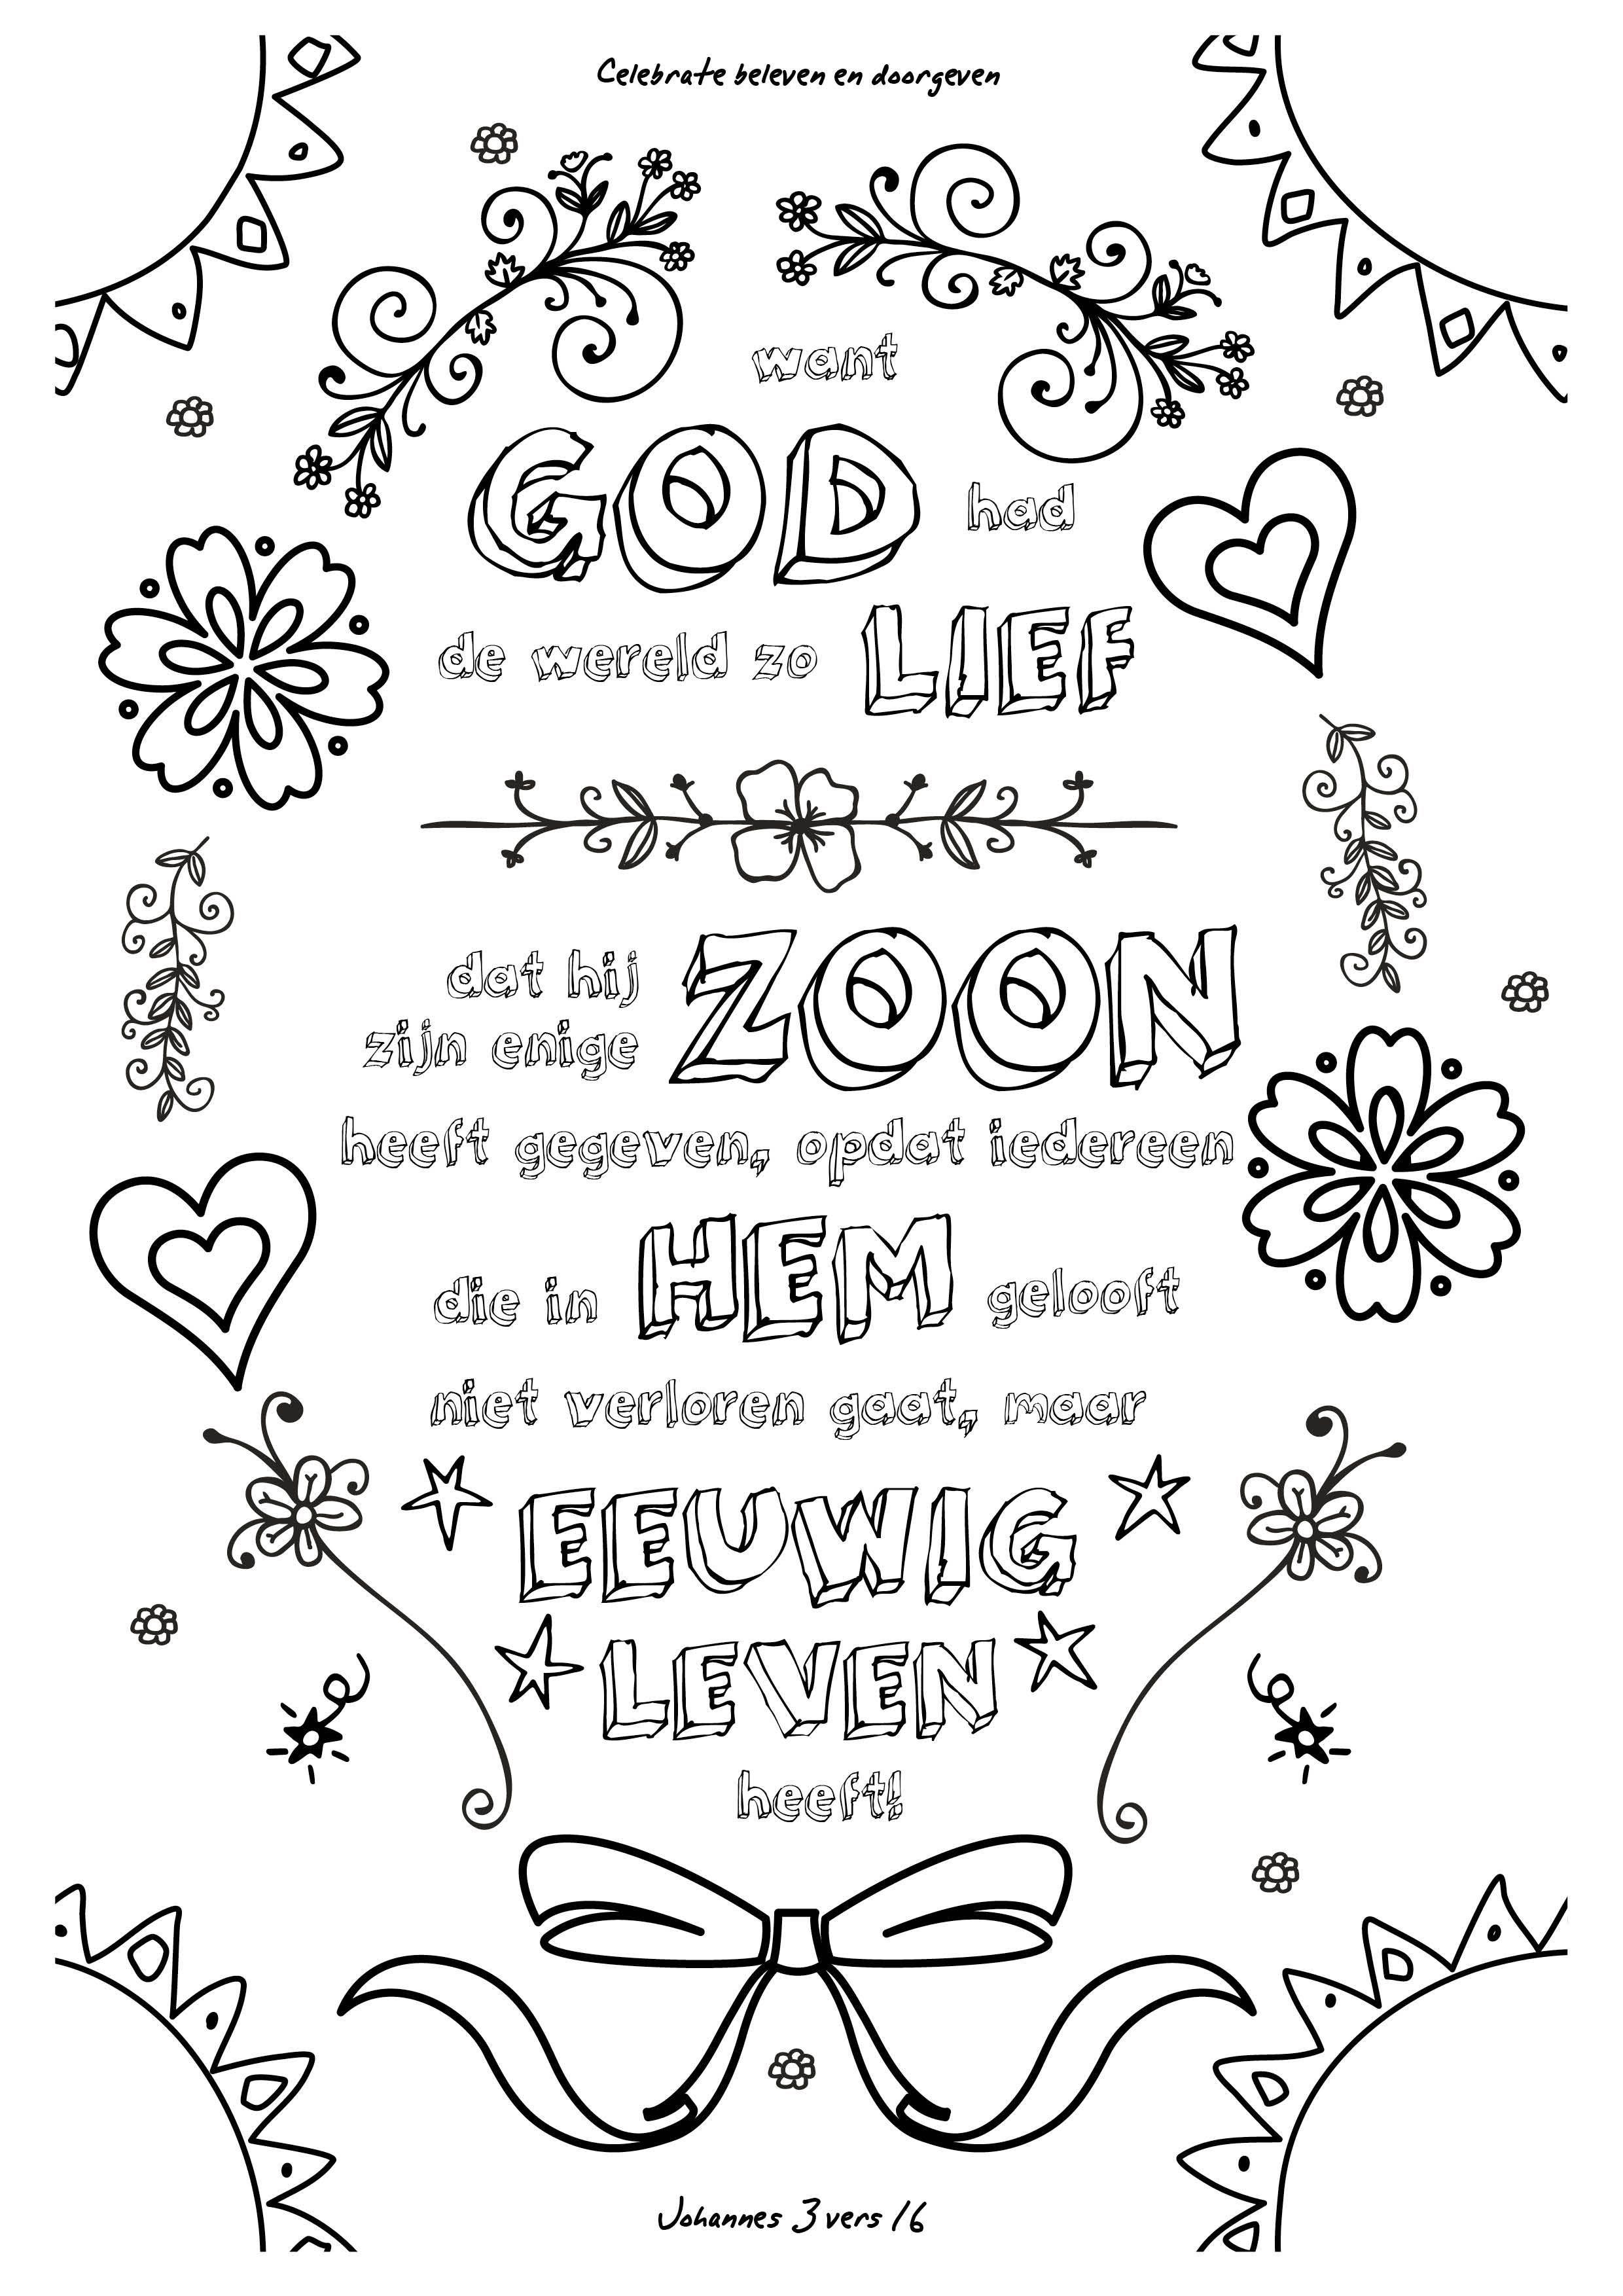 001 Want God Had De Wereld Zo Lief Kleurversjes Nl